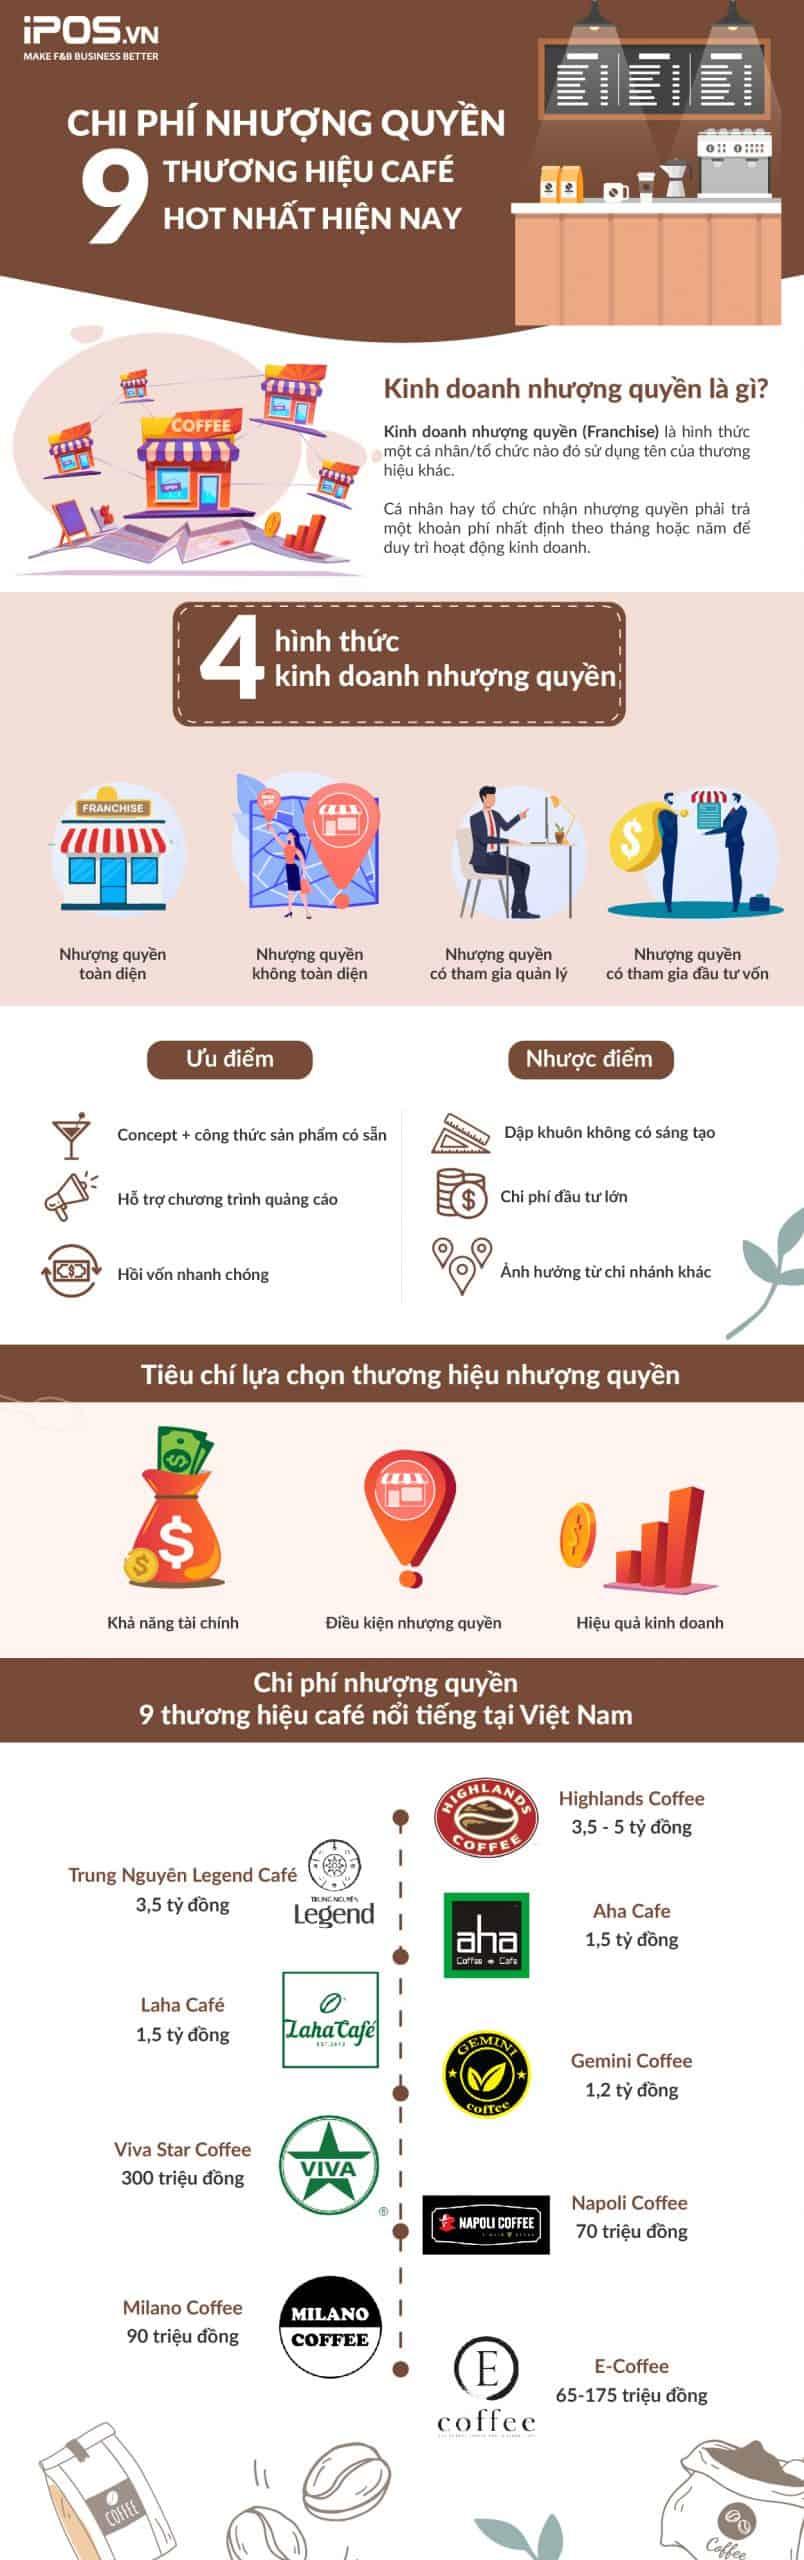 chi phi nhuong quyen 01 1 scaled